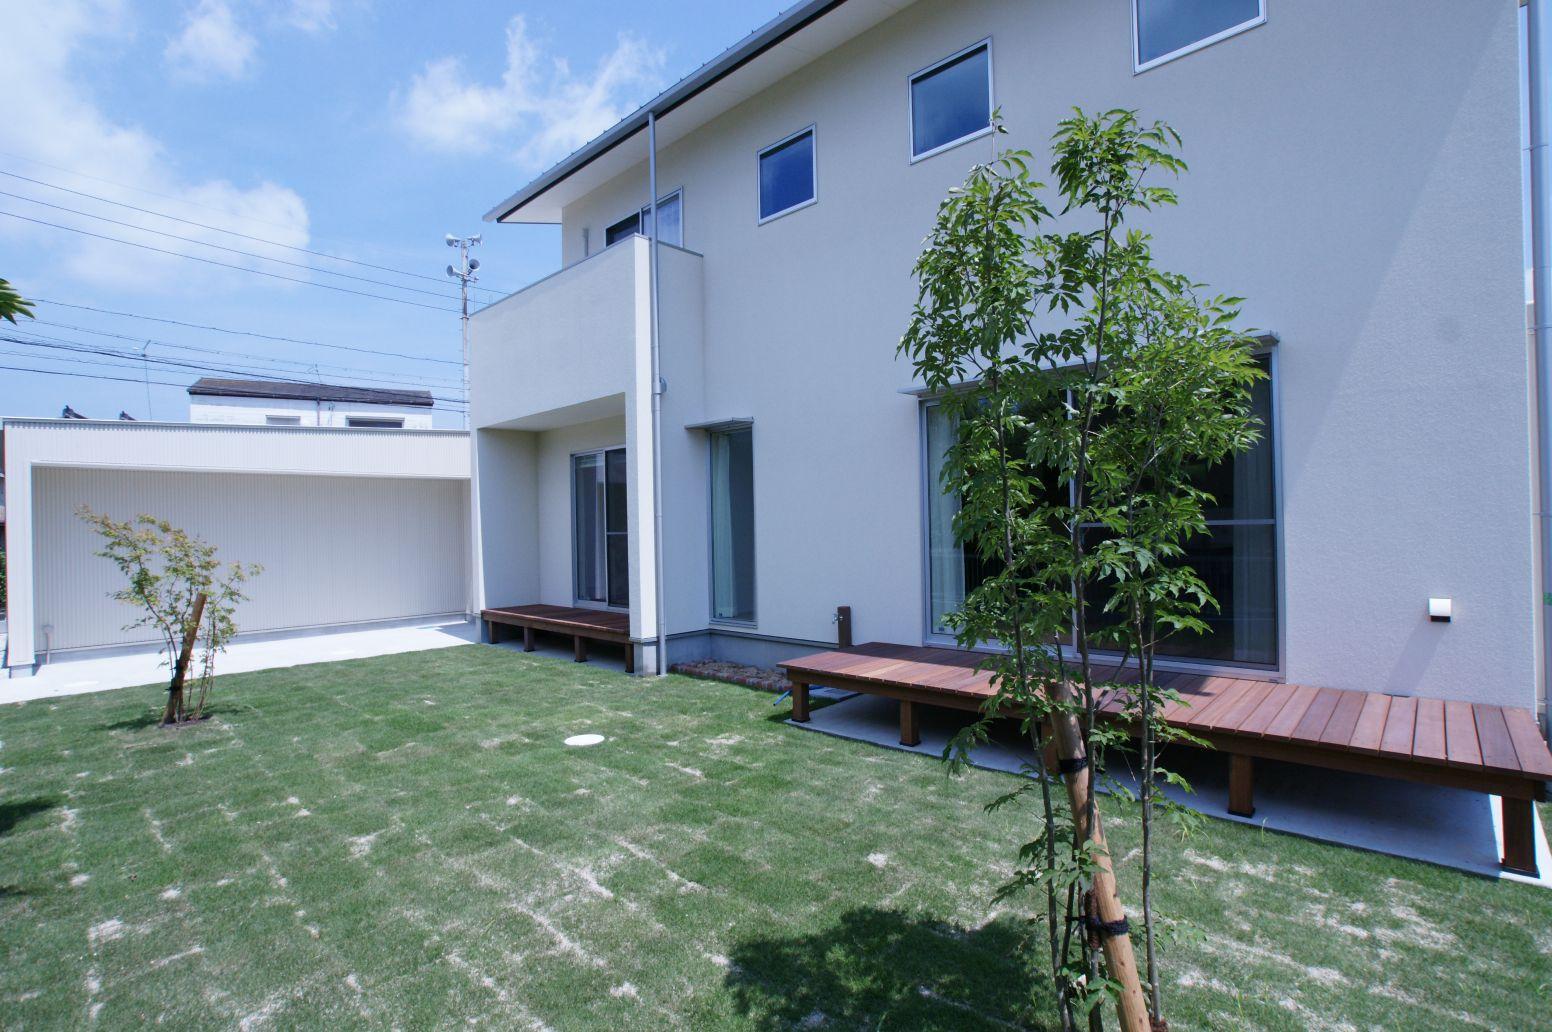 RIKYU (リキュー)【デザイン住宅、建築家、インテリア】グリーンが映える外観